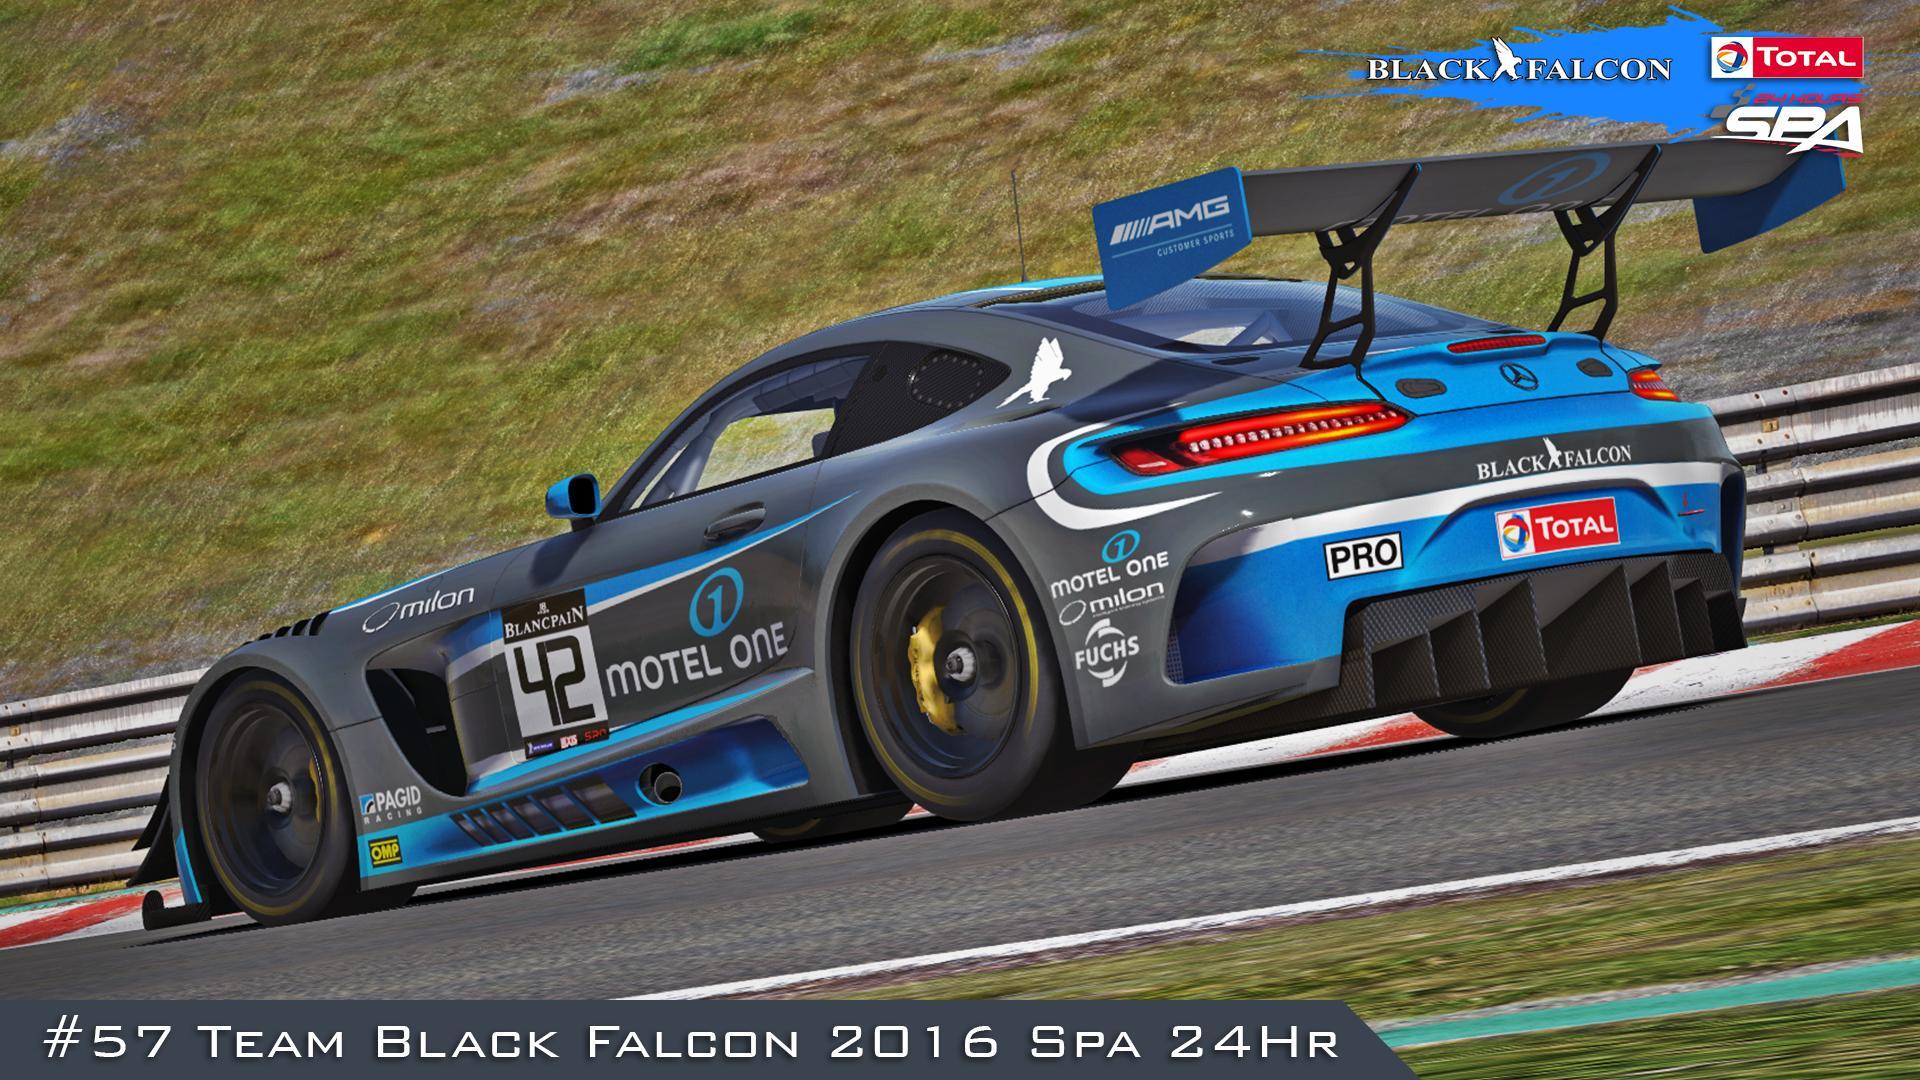 Preview of #57 Team Black Falcon (2016 Spa 24Hr) by Justin S Davis